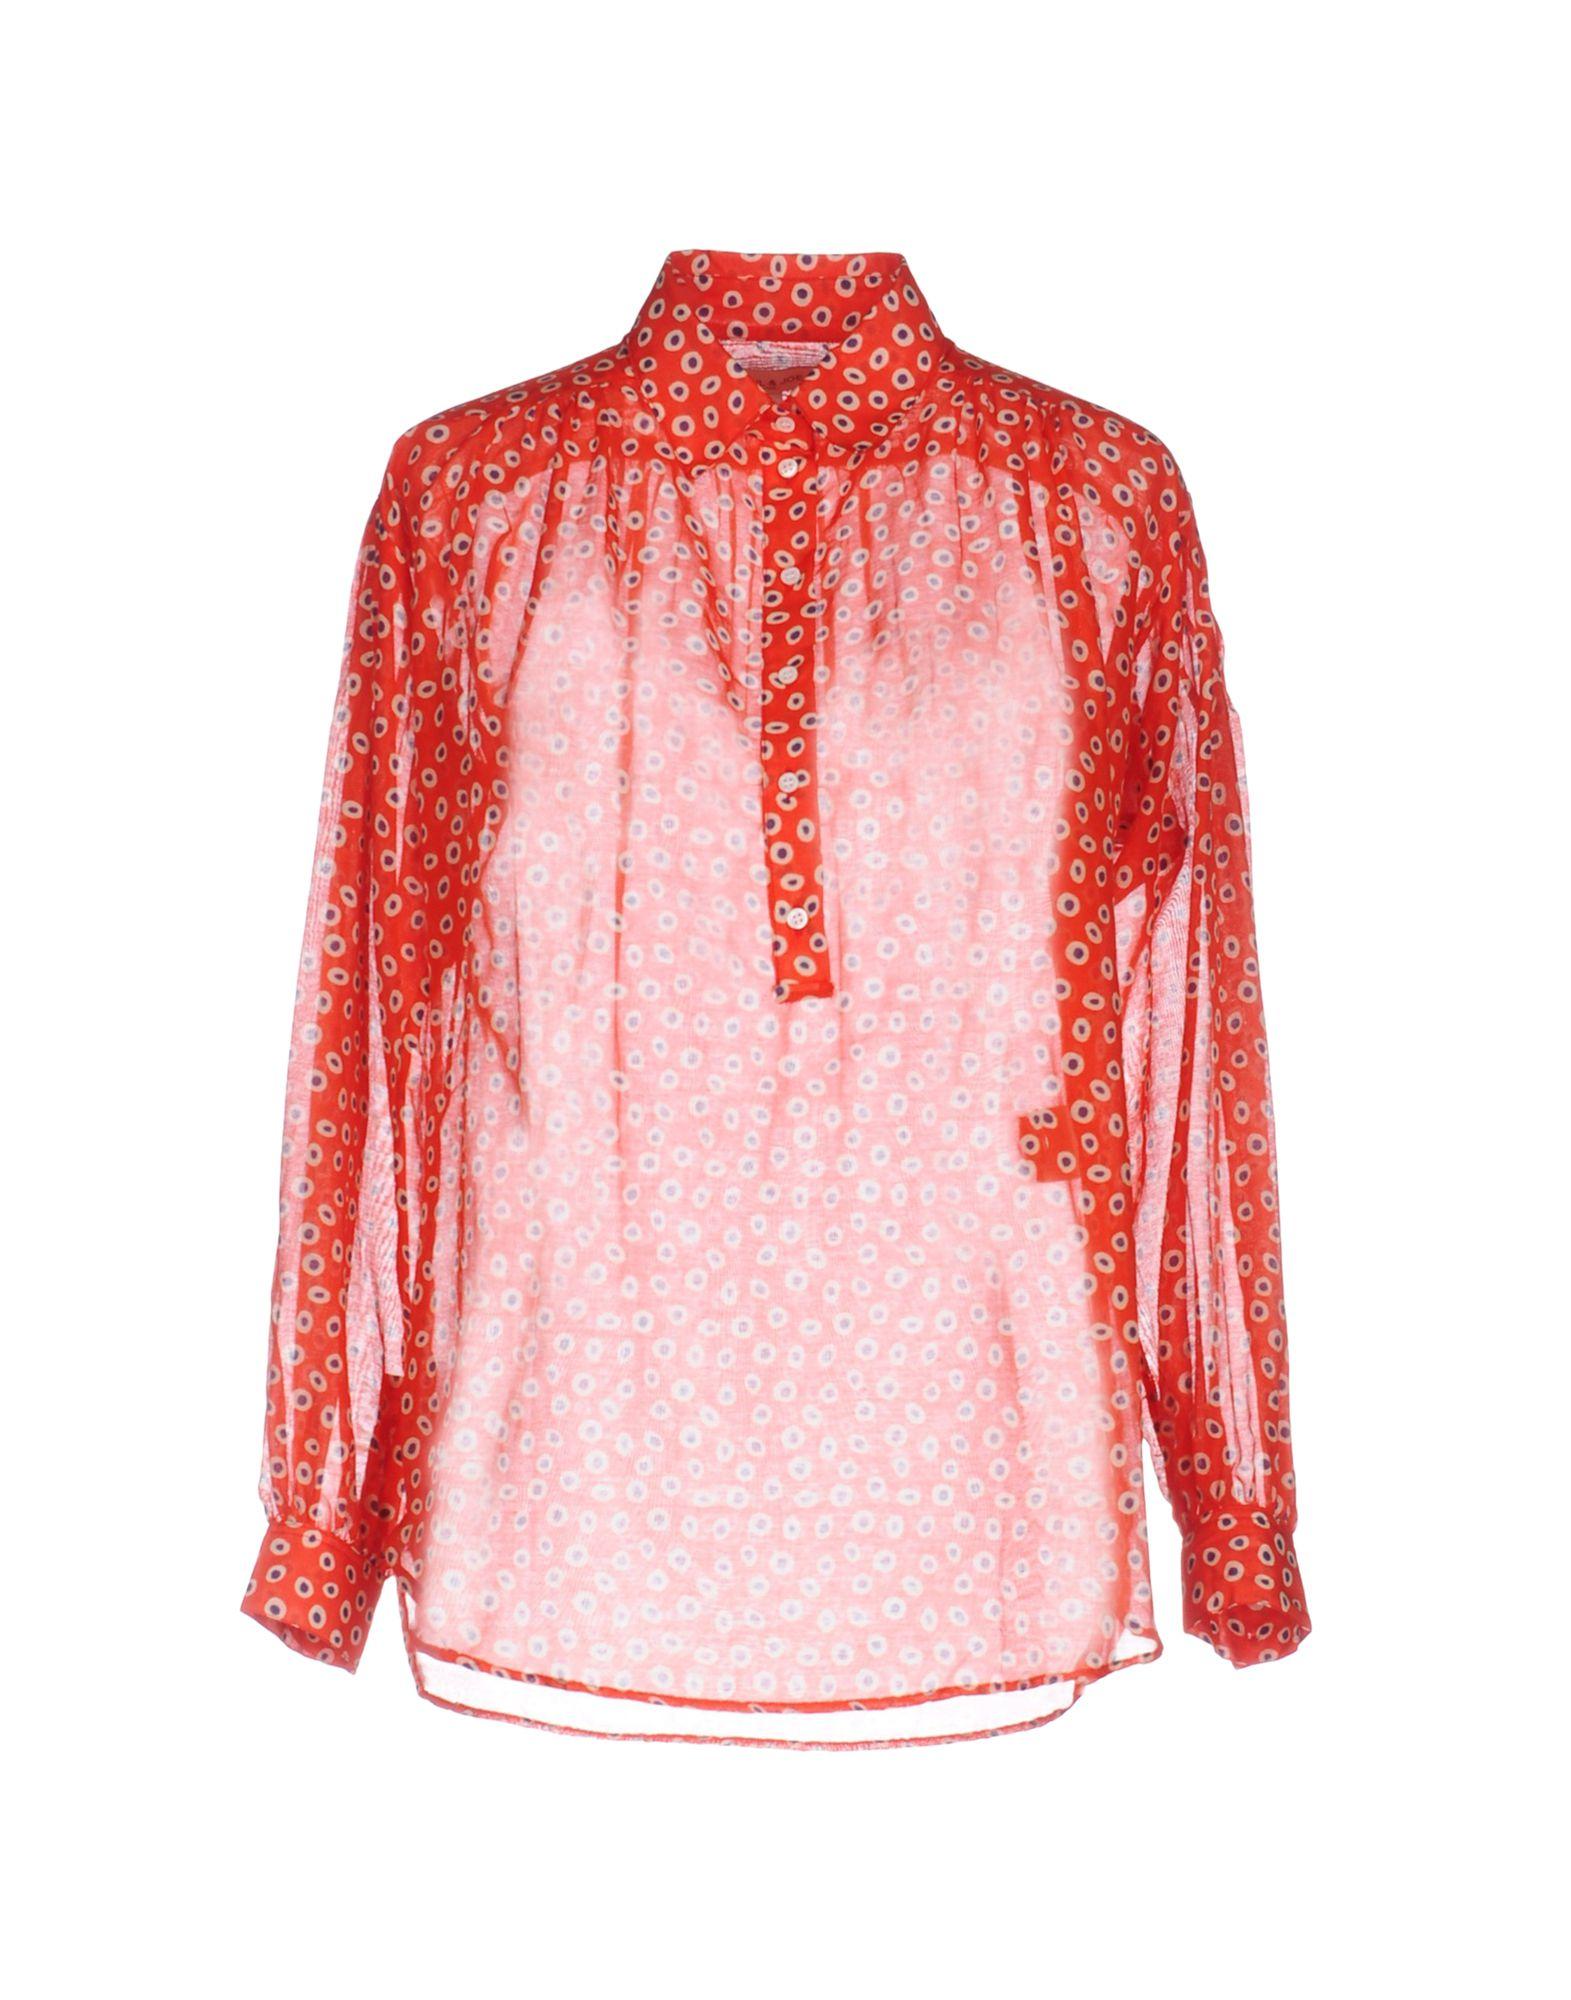 PAUL & JOE Damen Hemd Farbe Rot Größe 5 jetztbilligerkaufen